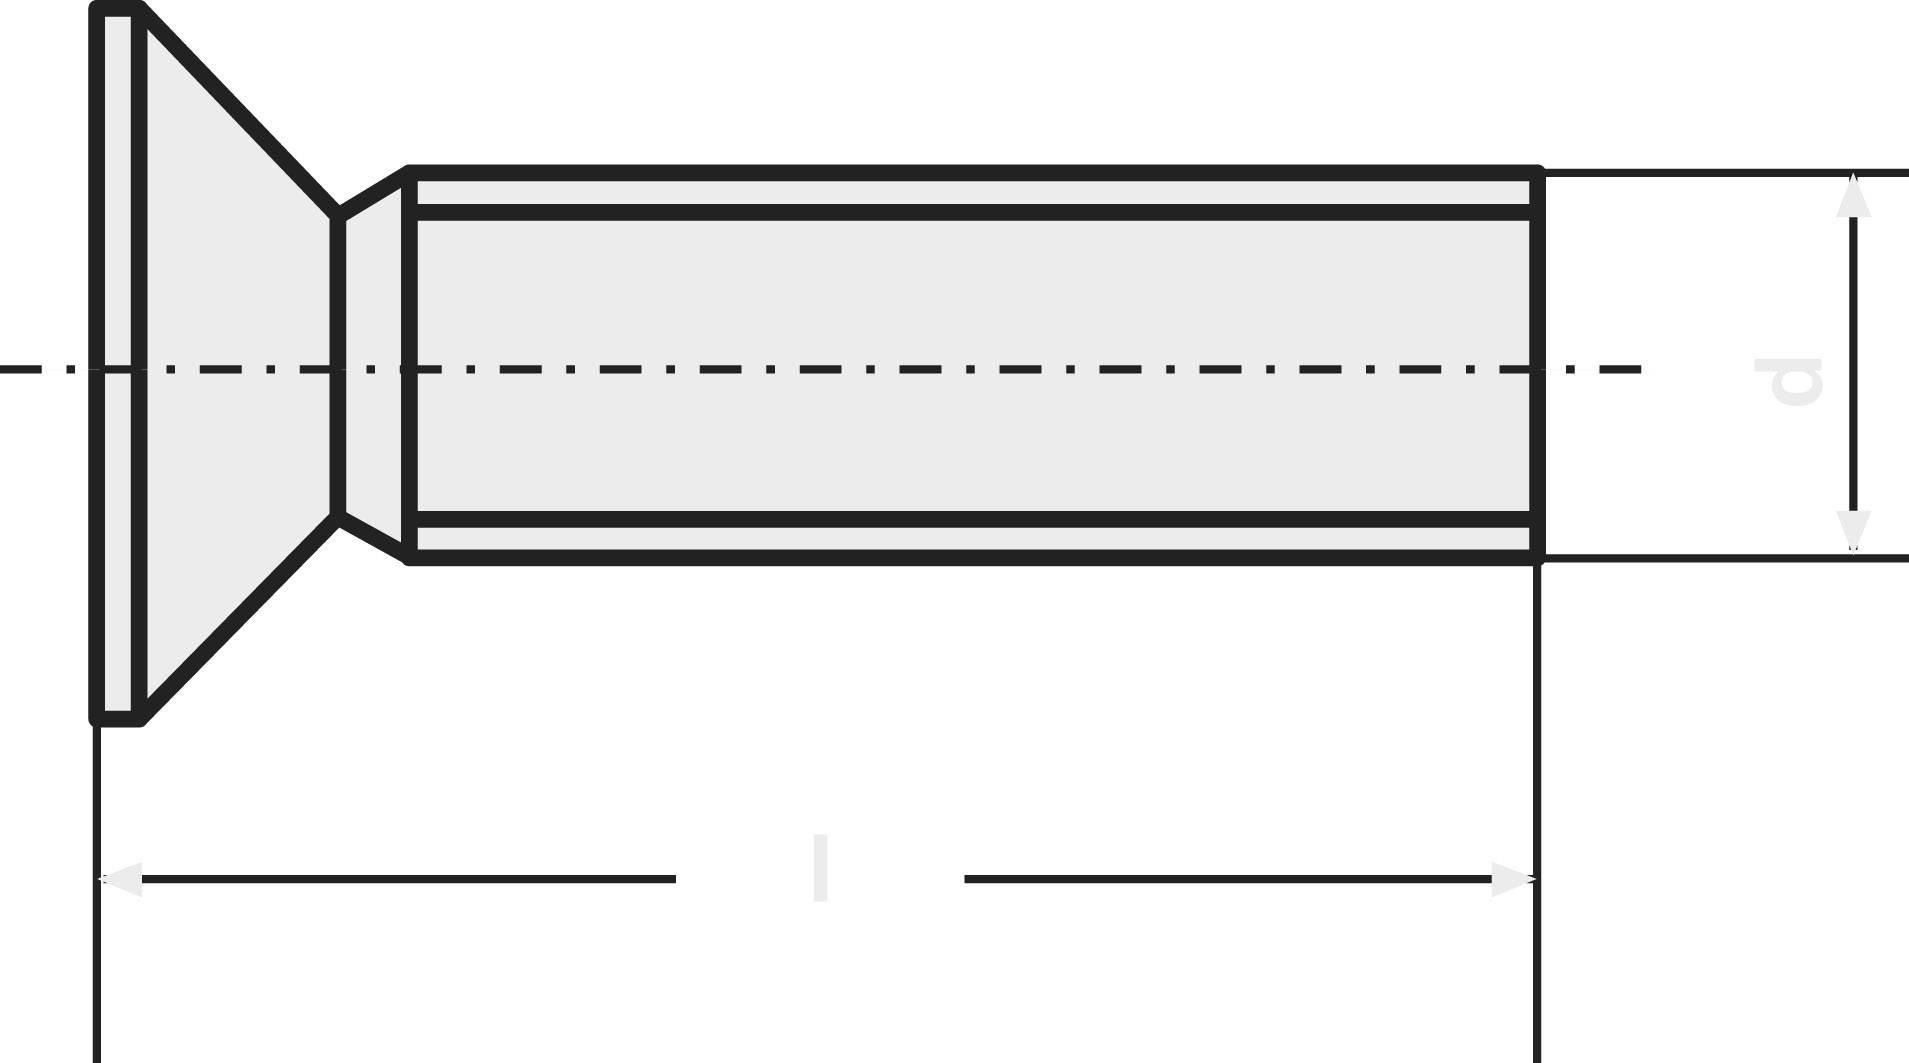 Zápustný šroub TOOLCRAFT 839911, Torx, M2,5, DIN 965, 12 mm, ušlechtilá ocel, 20 ks